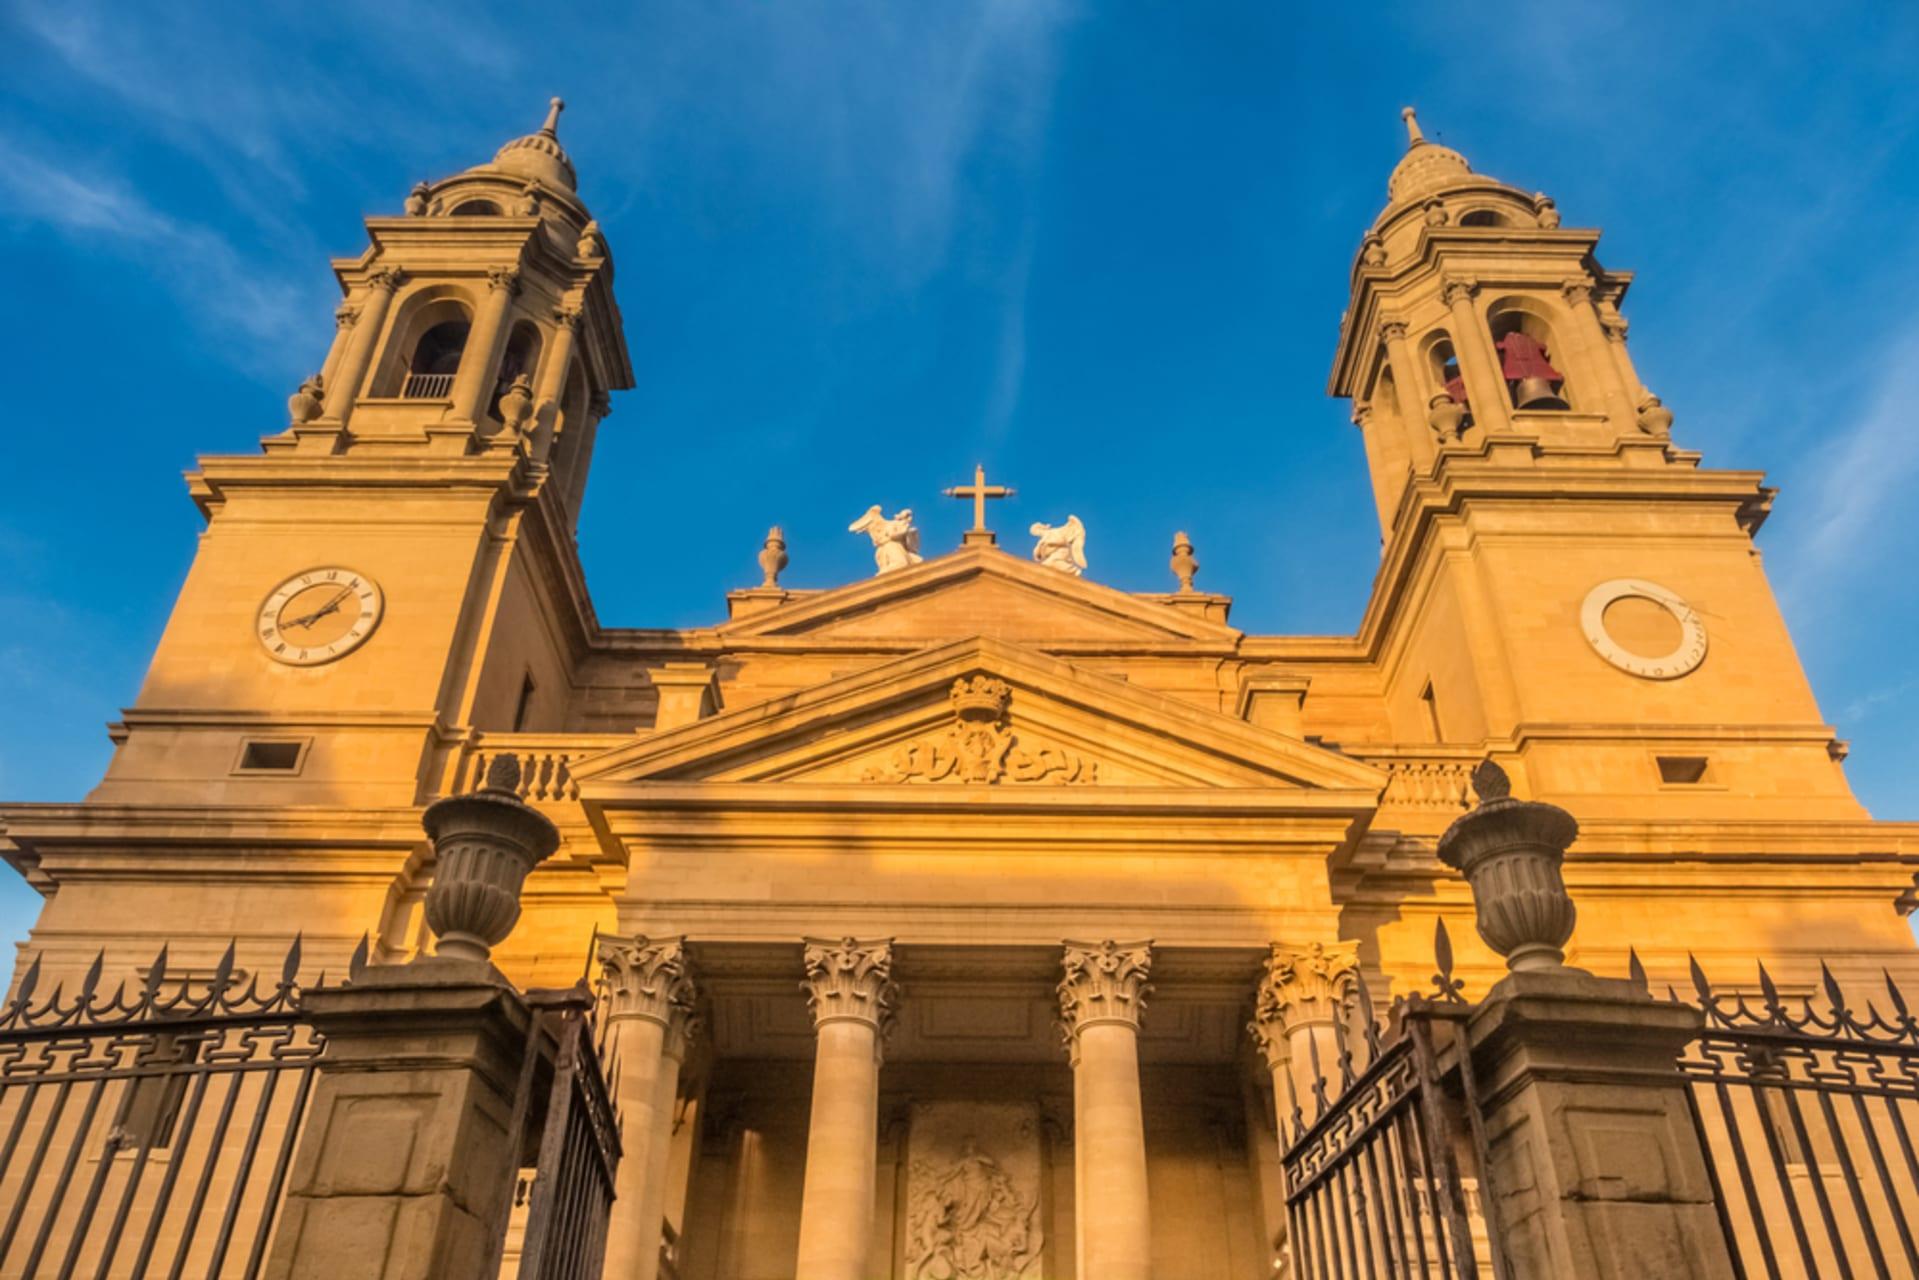 Pamplona - Highlights of Pamplona